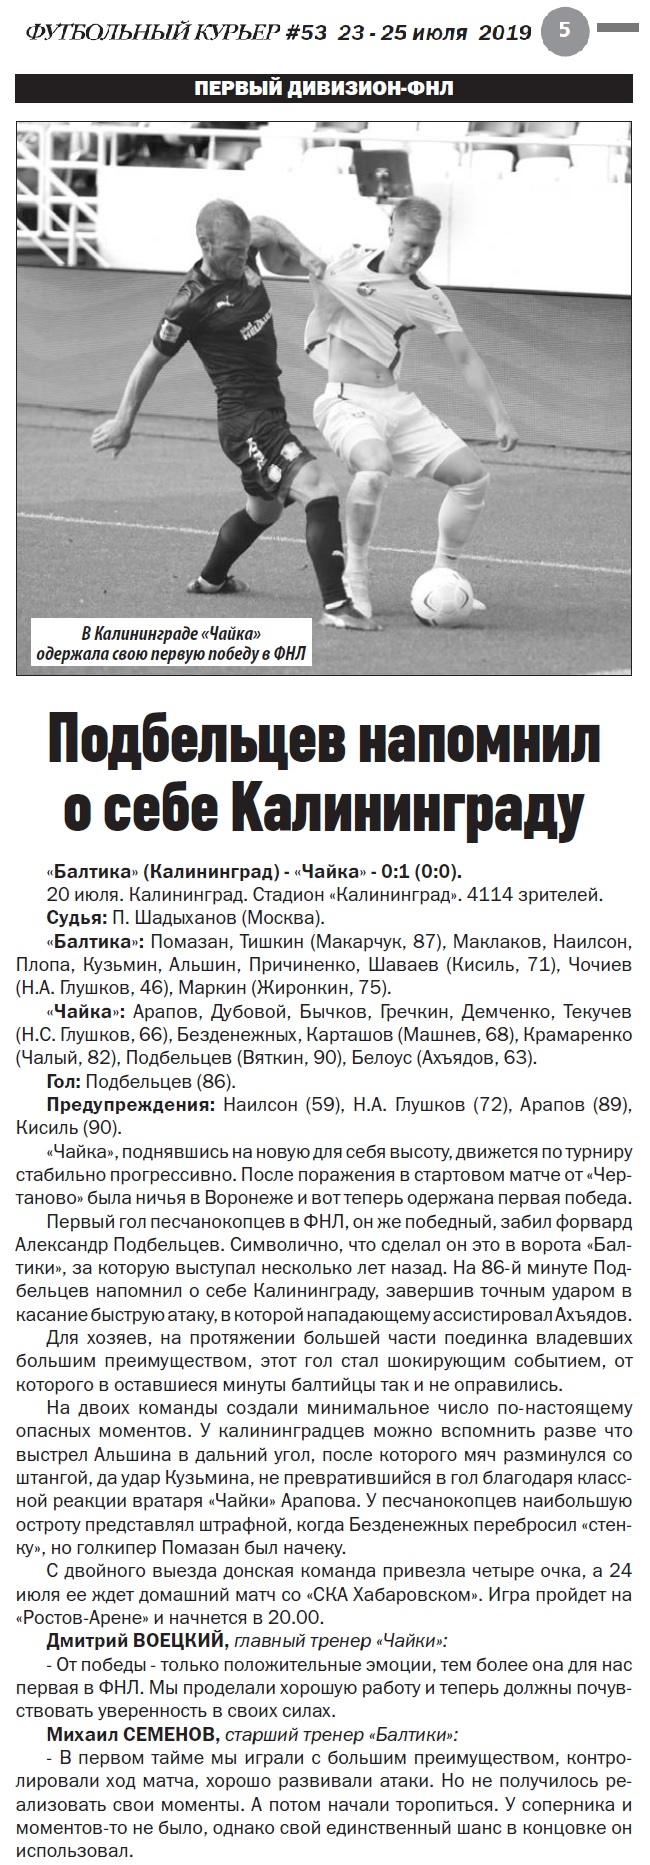 Балтика (Калининград) - Чайка (Песчанокопское) 0:1